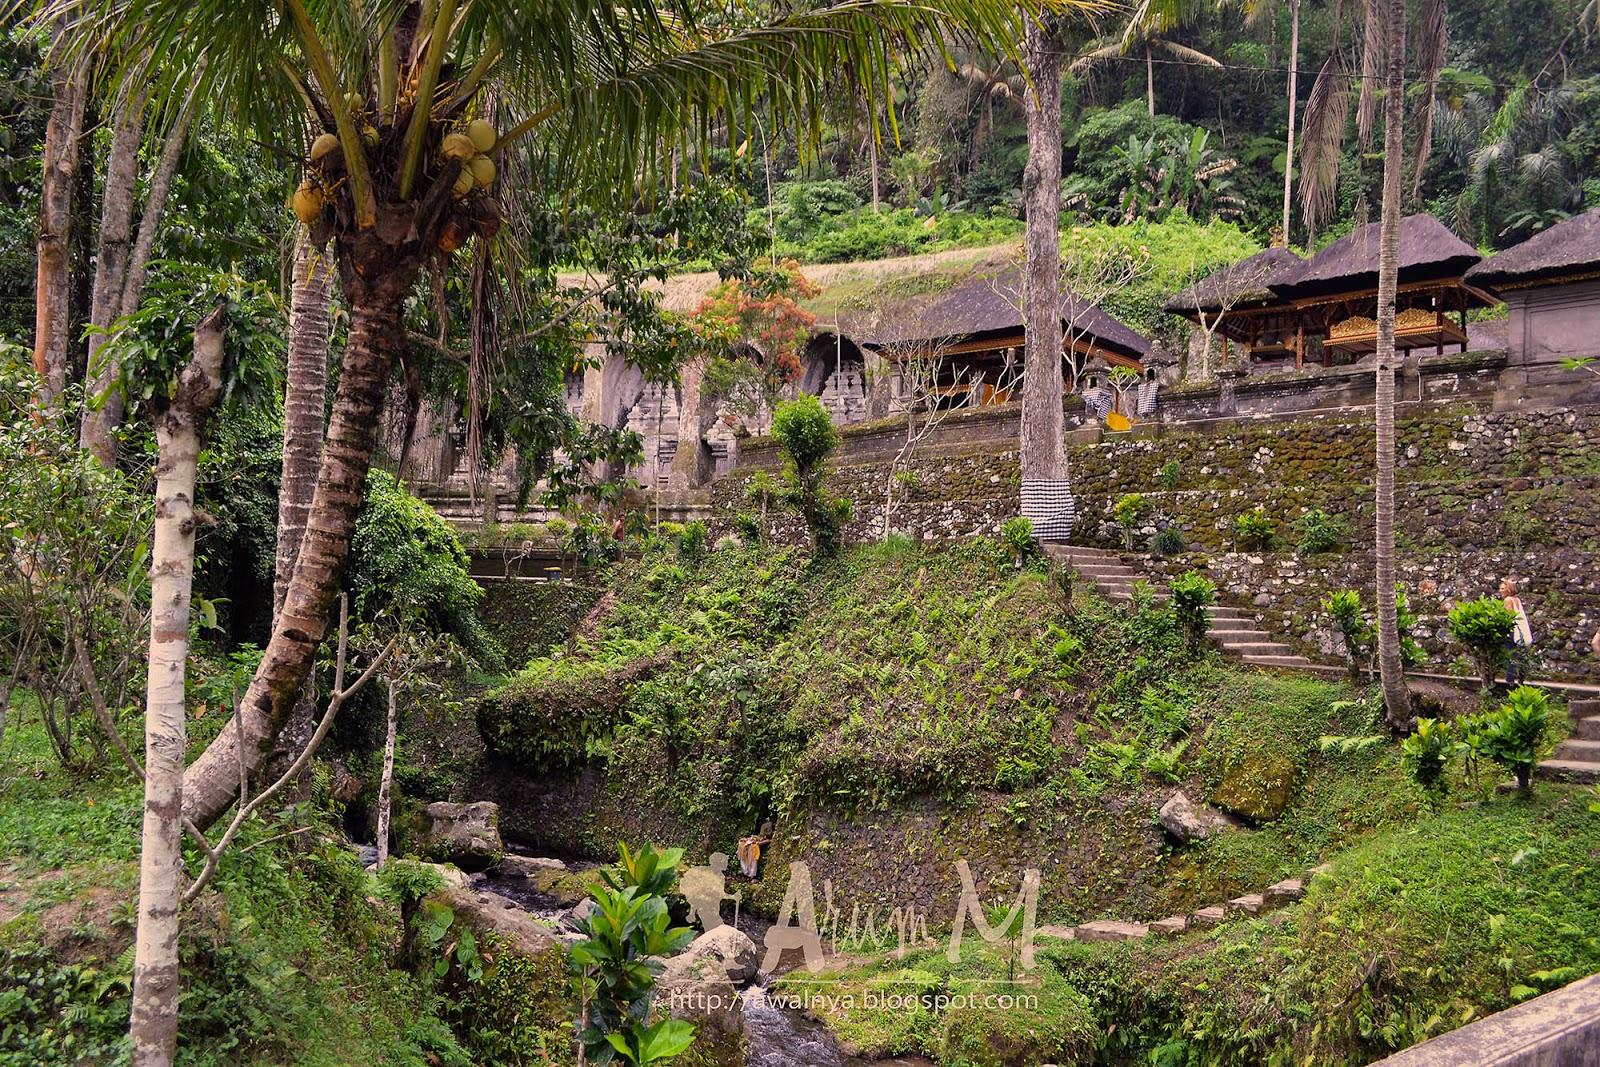 Indonesia Sungguh Indah Pura Candi Gunung Kawi Lembah Para Raja